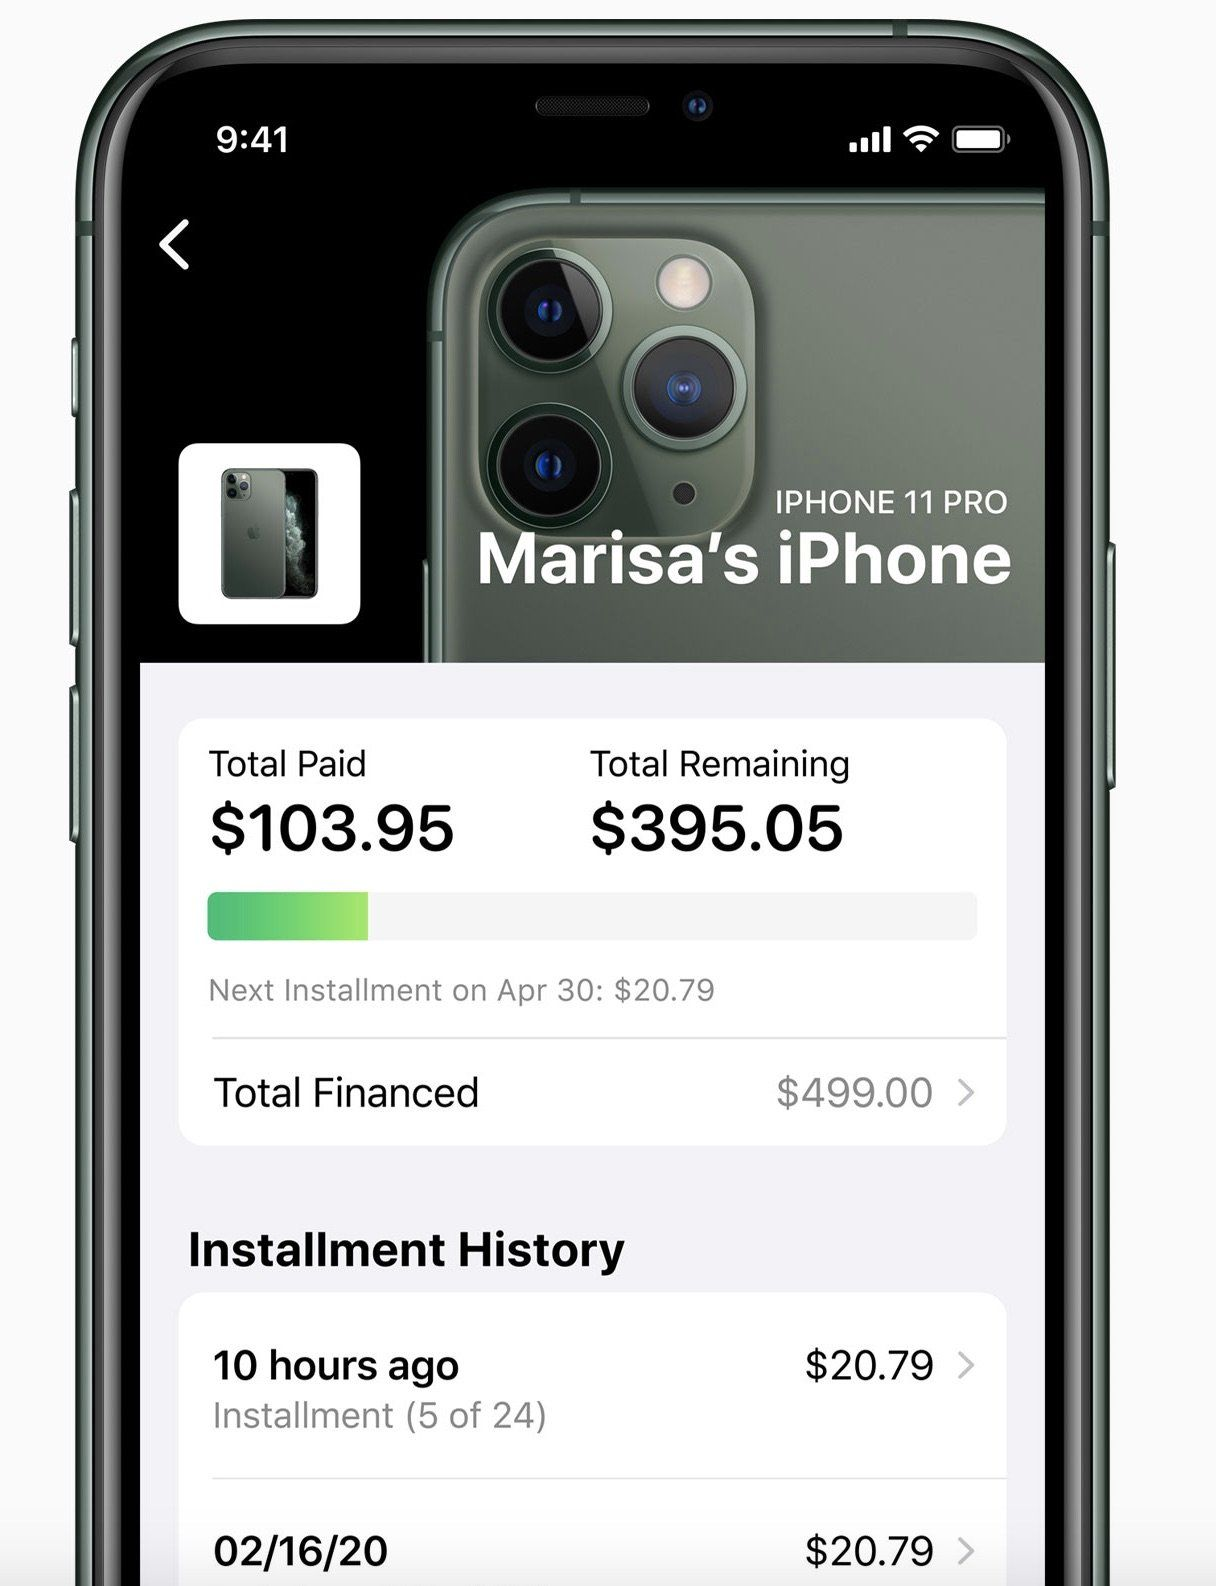 Apple cards 24month interestfree iphone installment